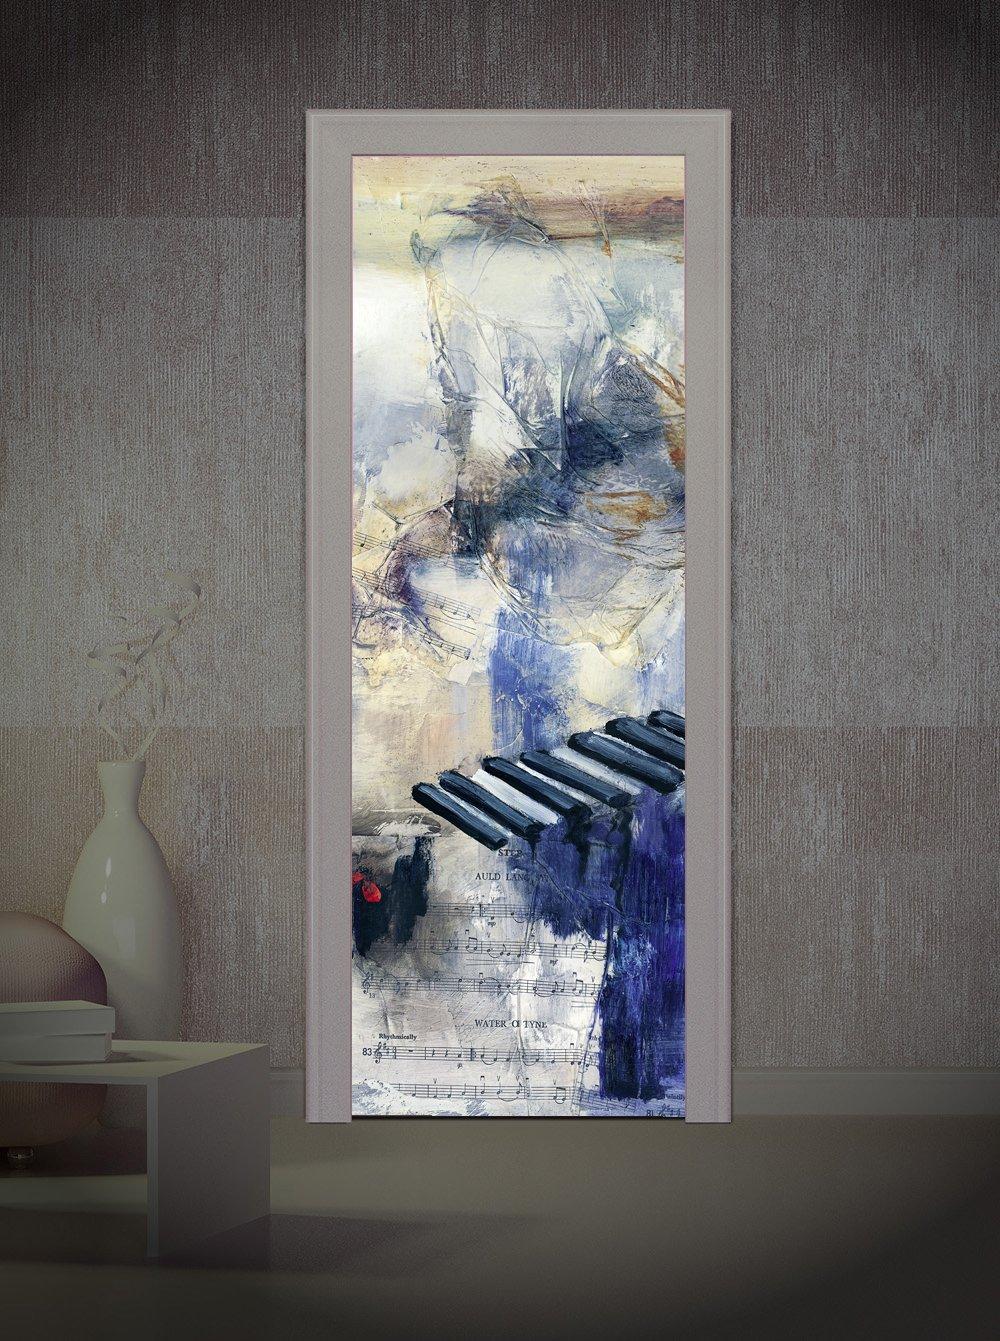 Decoralive Cenefa Vetas - Imagen para Puerta, 83 x 211 x 0.05 cm: Amazon.es: Hogar